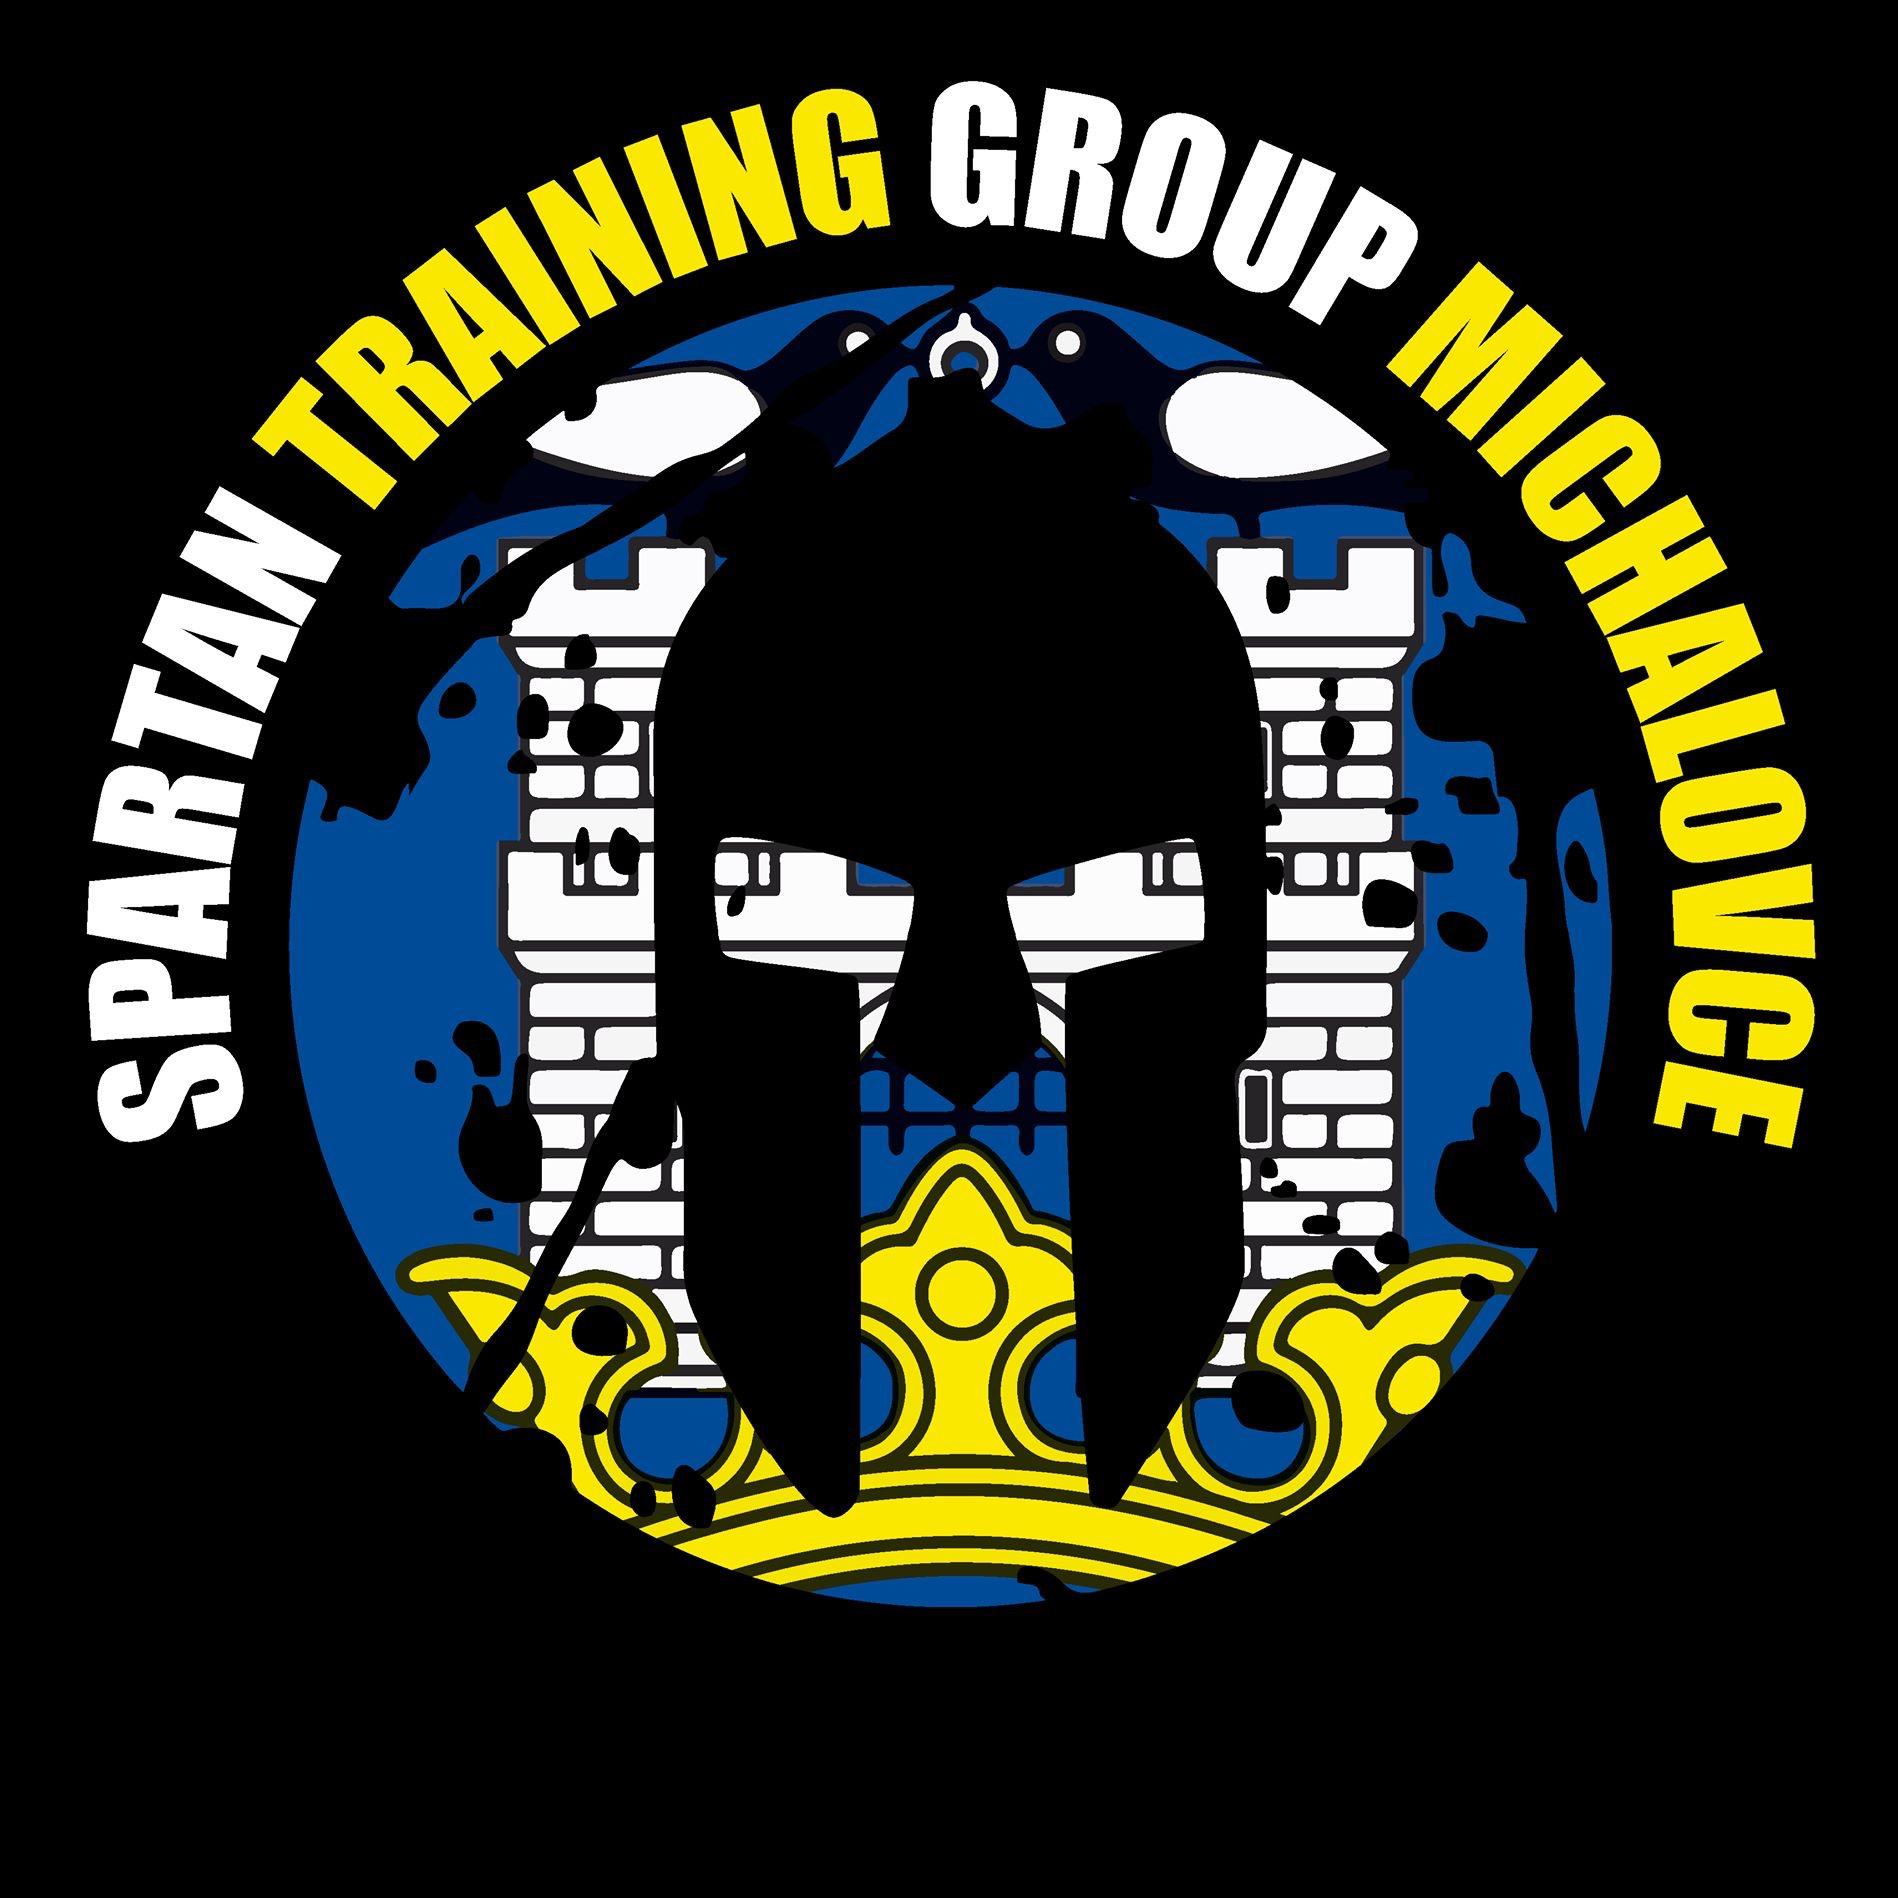 /images/com_odtatierkdunaju/teams/2020_Spartan-Training-Group-Michalovce.jpeg